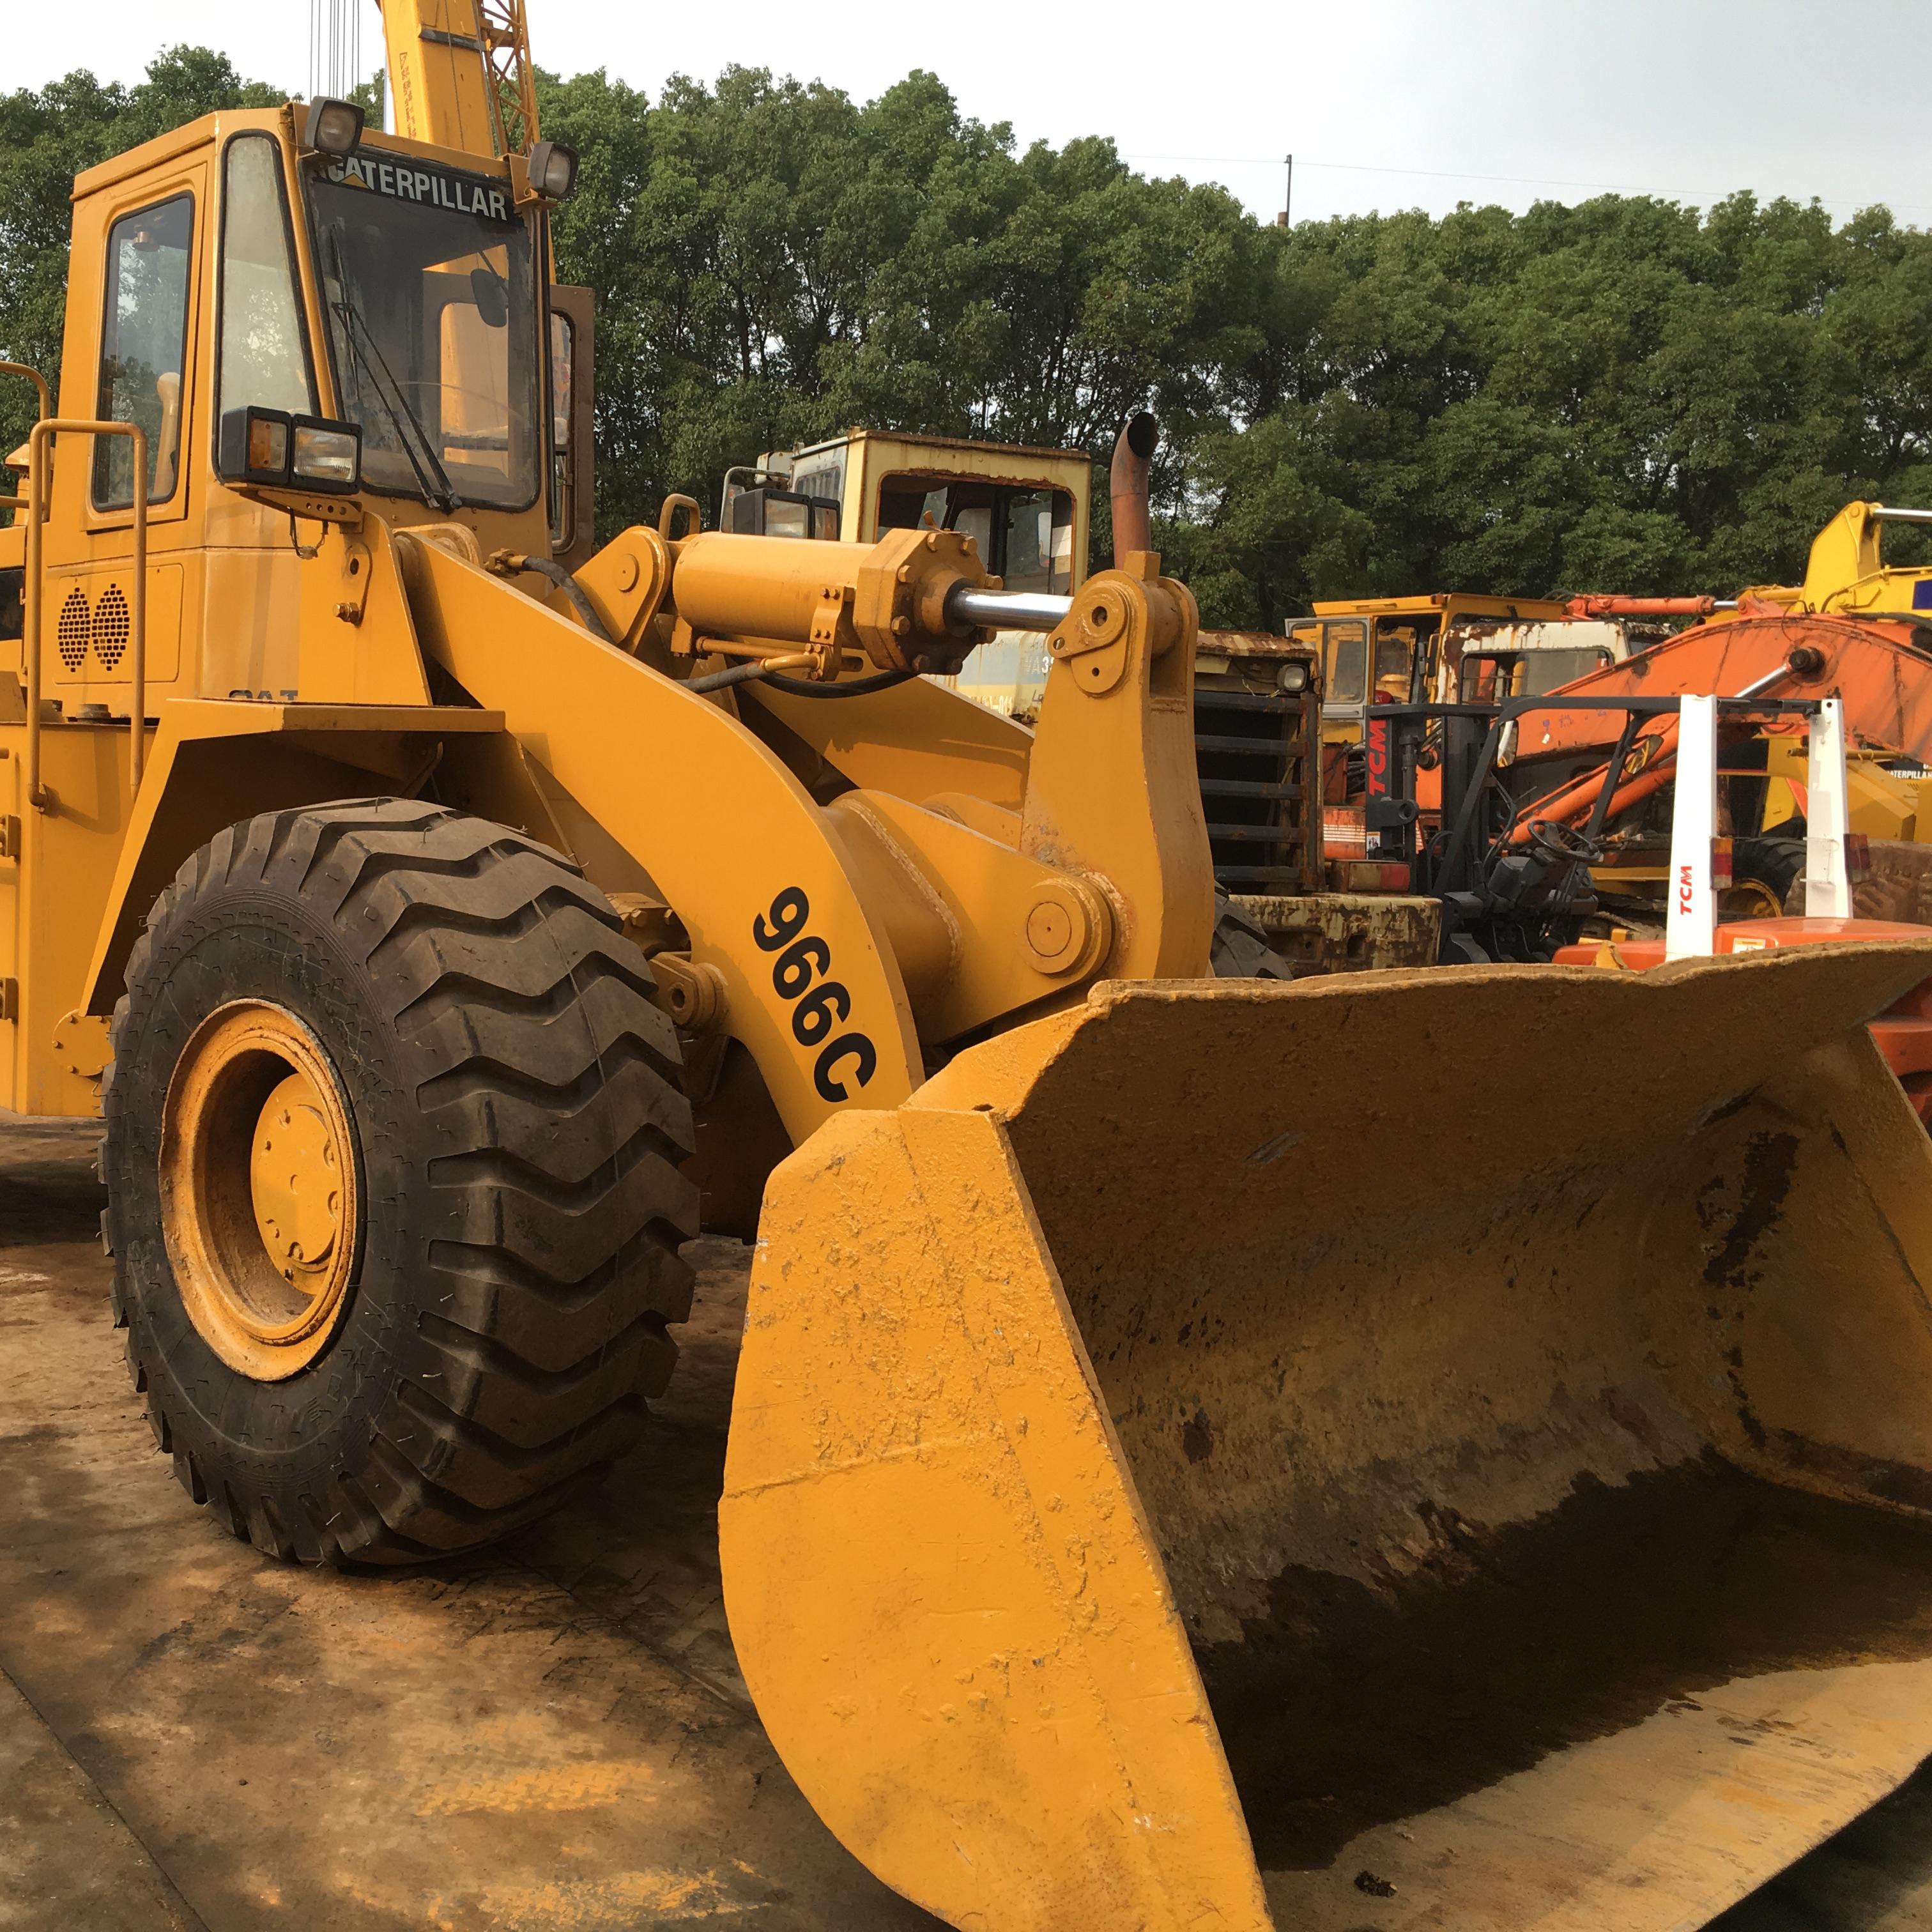 7X2688 Tilt Cylinder Seal Kit Fits Cat fits Caterpillar 980C 980F-980G-980H